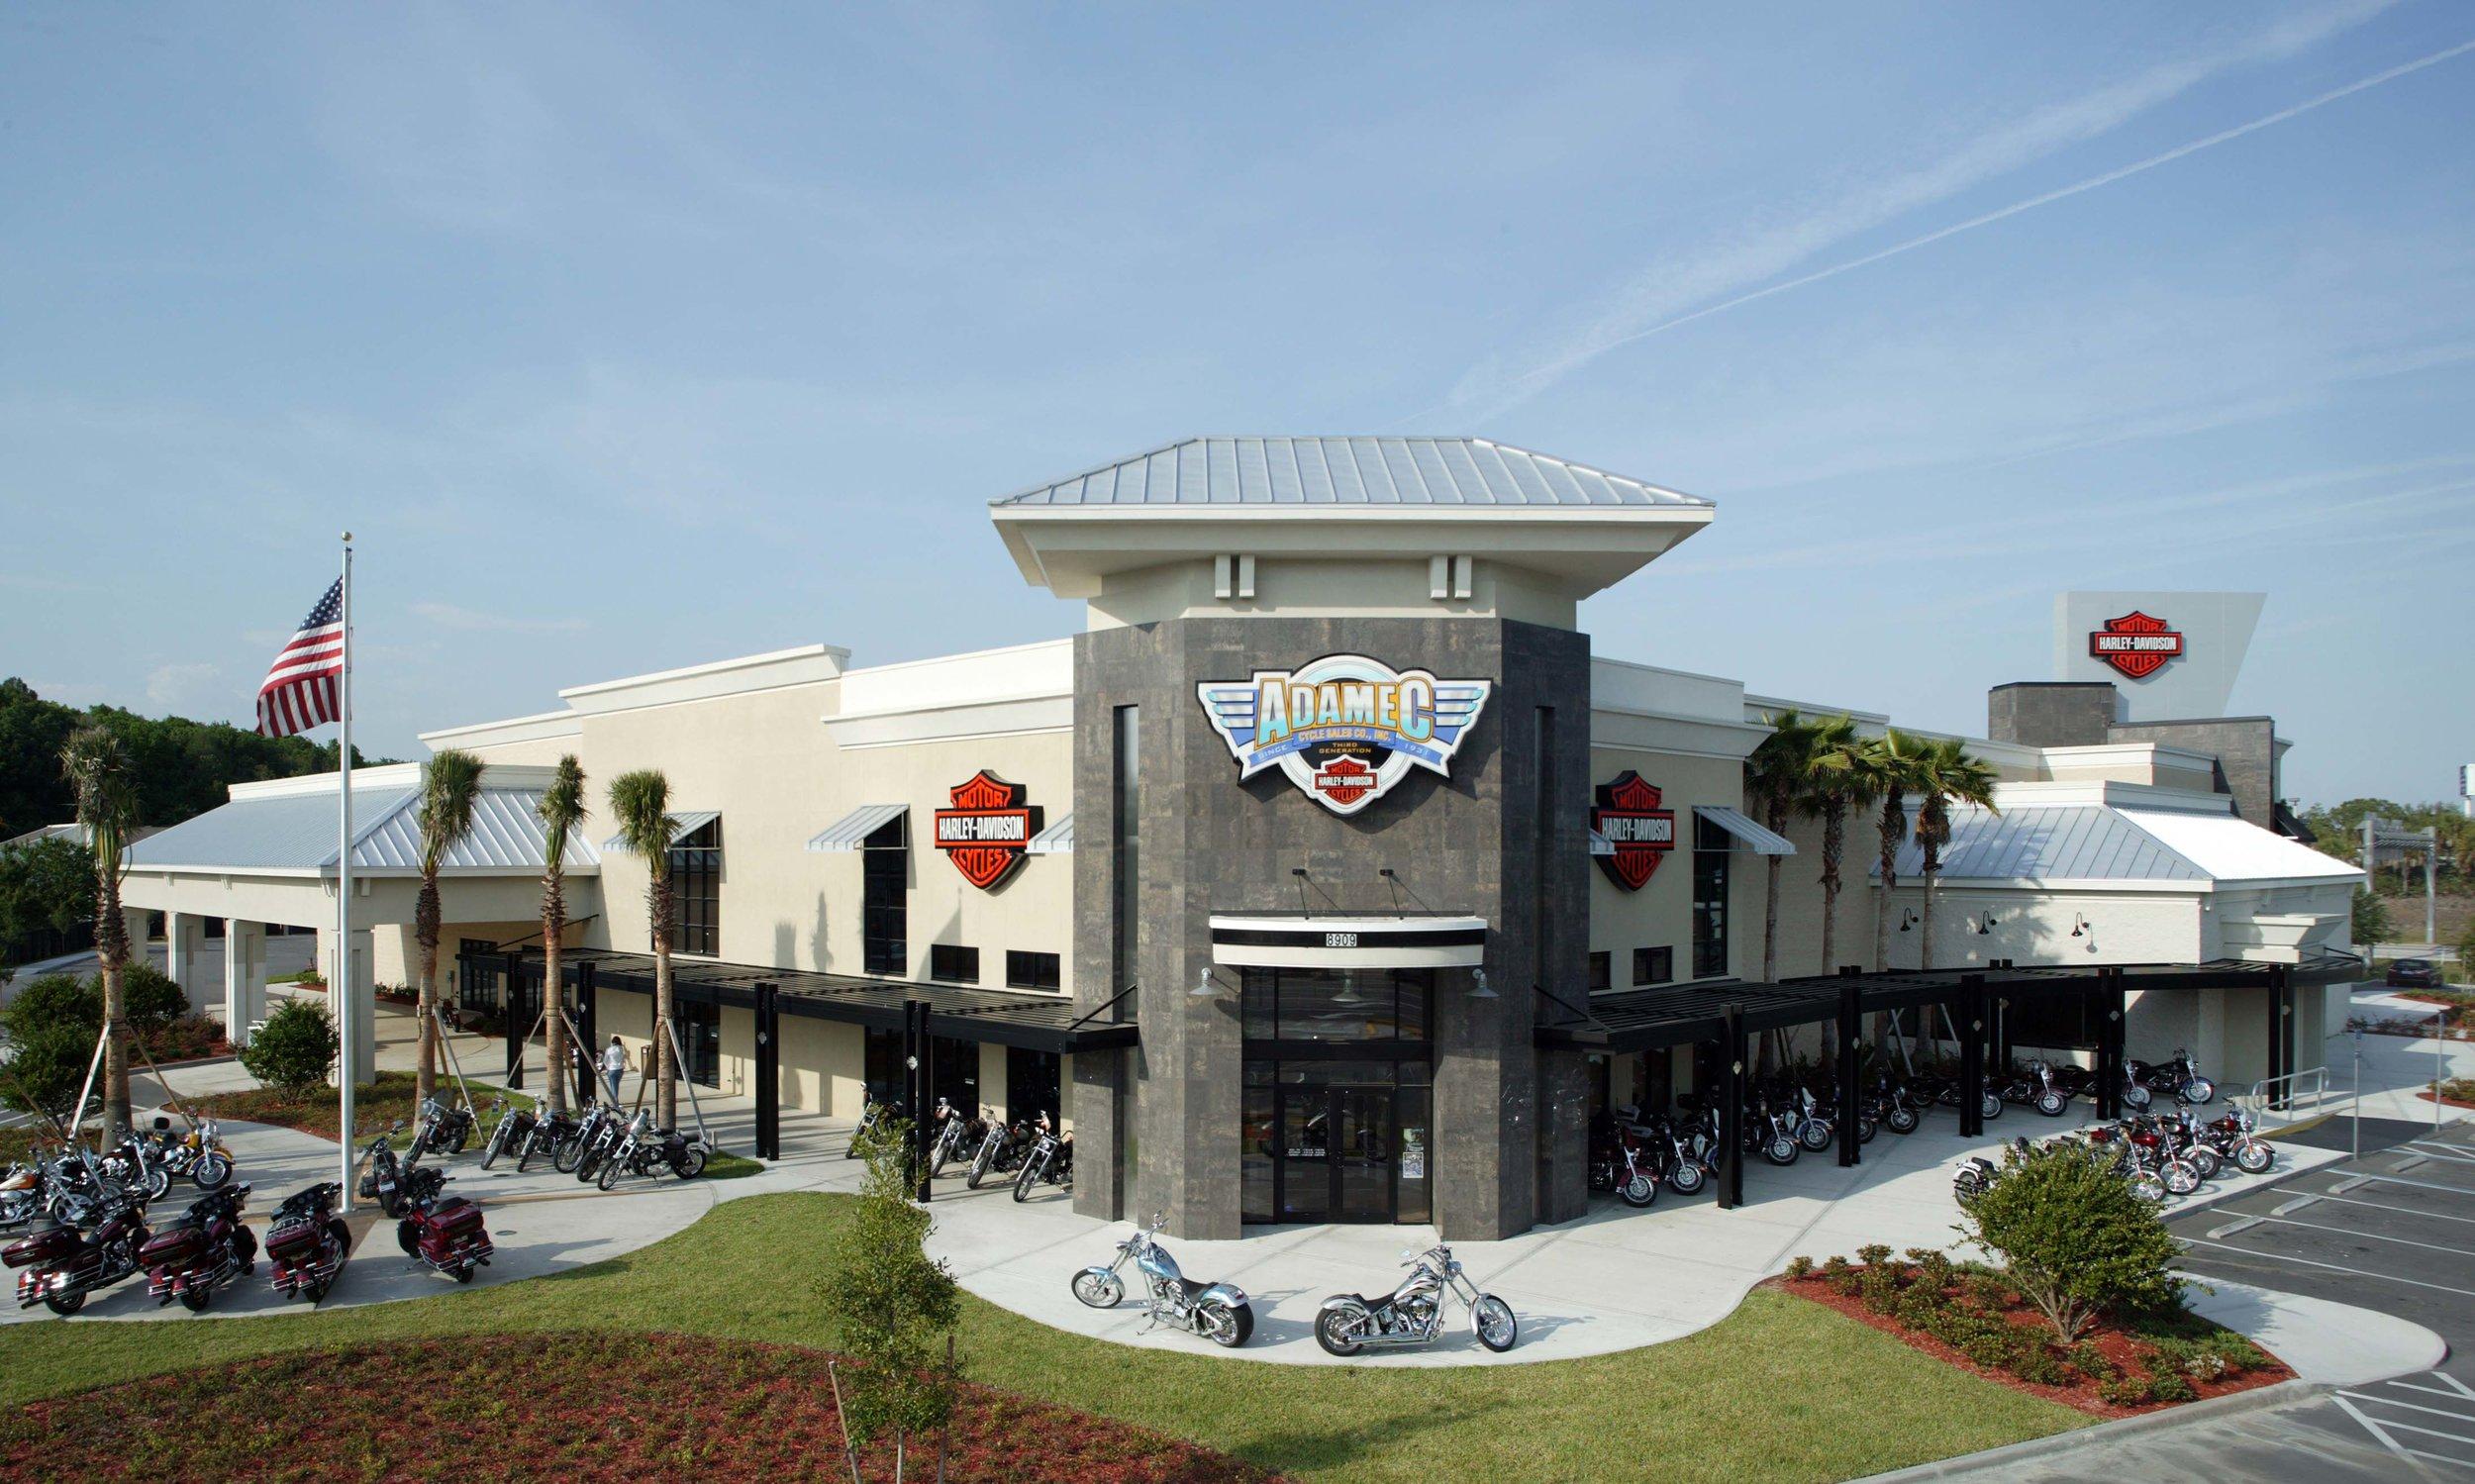 adamec-adamec harley davidson-harley davidson-jacksonville-florida-northeast florida-southeastern united states-commercial interior design-licensed interior designer-facade.jpg